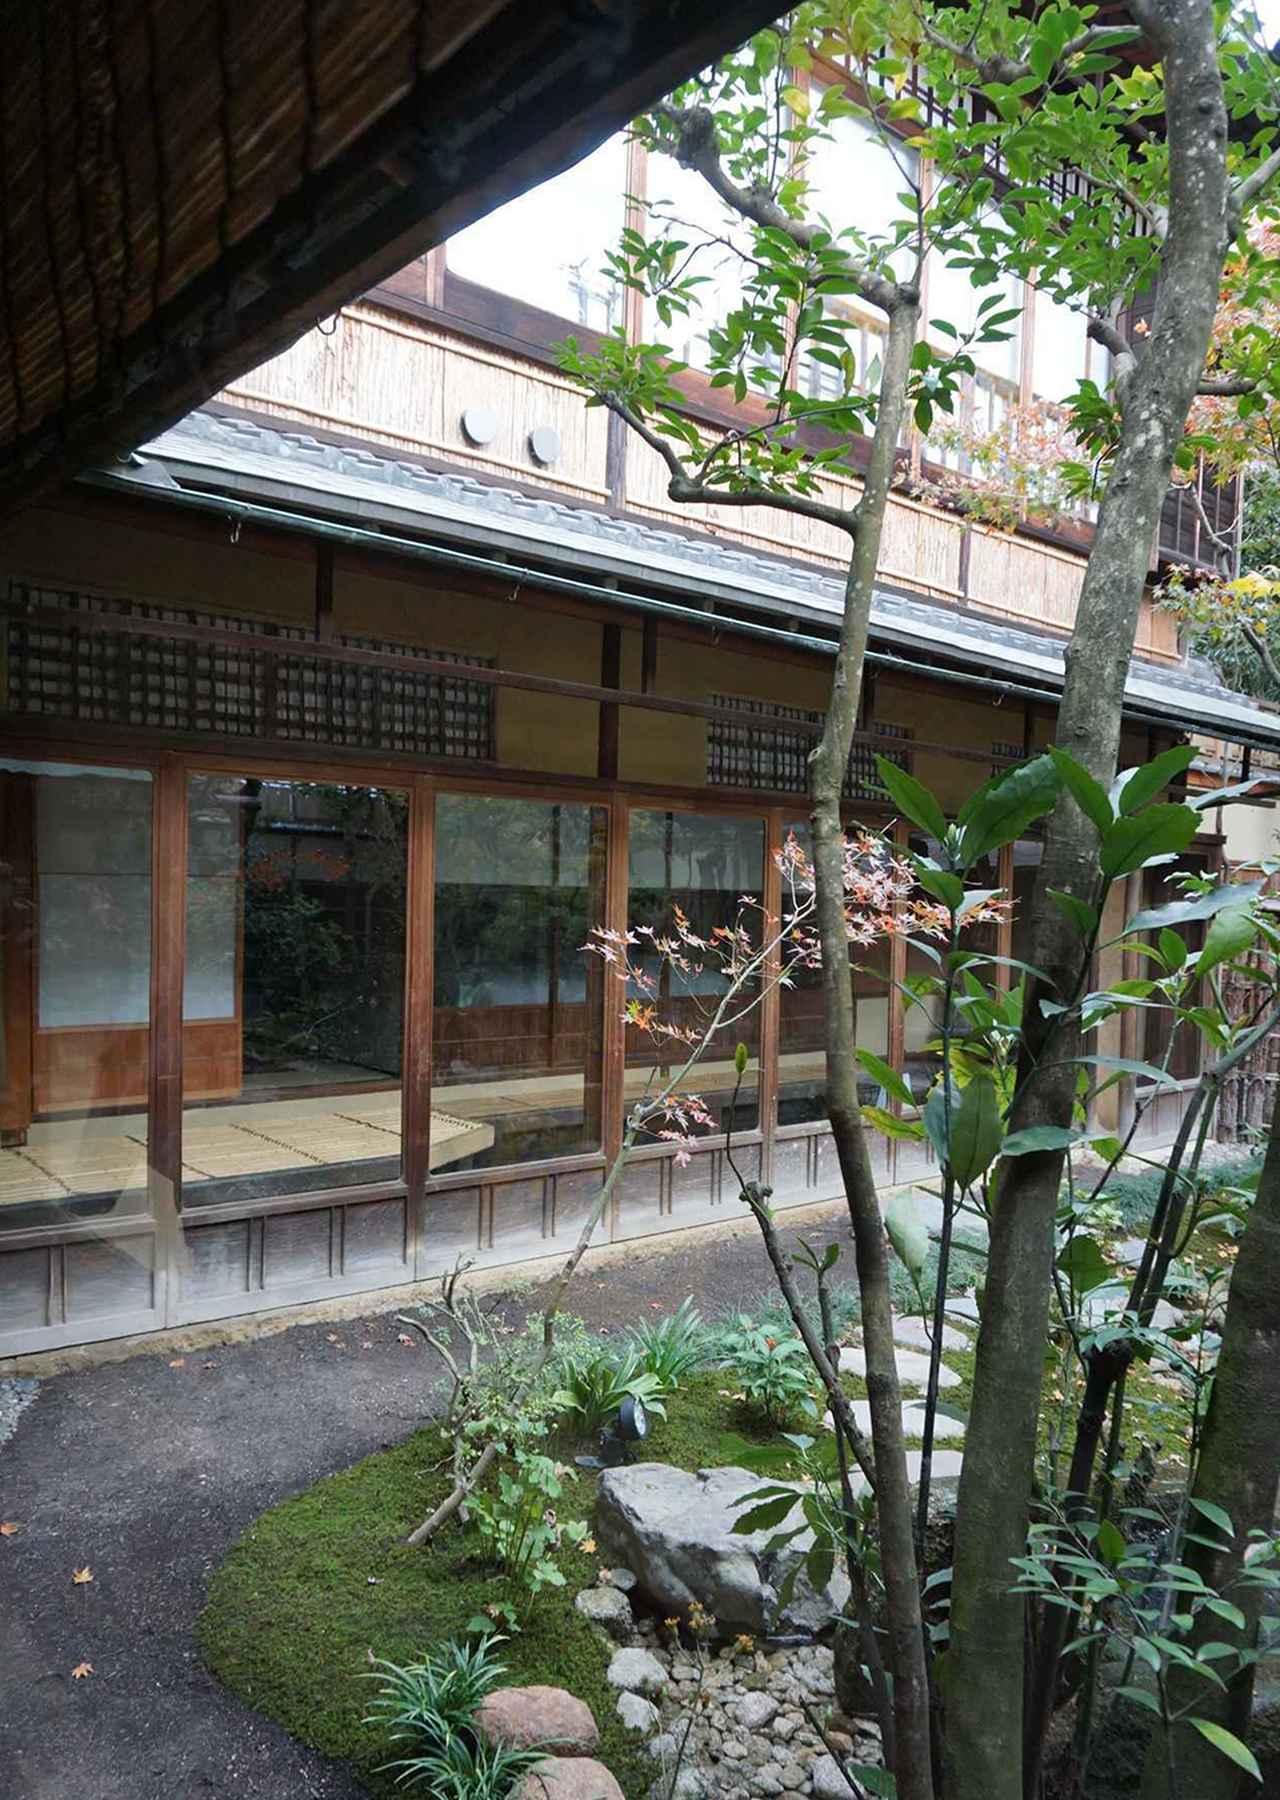 Images : 2番目の画像 - 「歴史ある数寄屋建築の粋を愉しむ。 京都・祇園八坂の大人宿 「SOWAKA」」のアルバム - T JAPAN:The New York Times Style Magazine 公式サイト